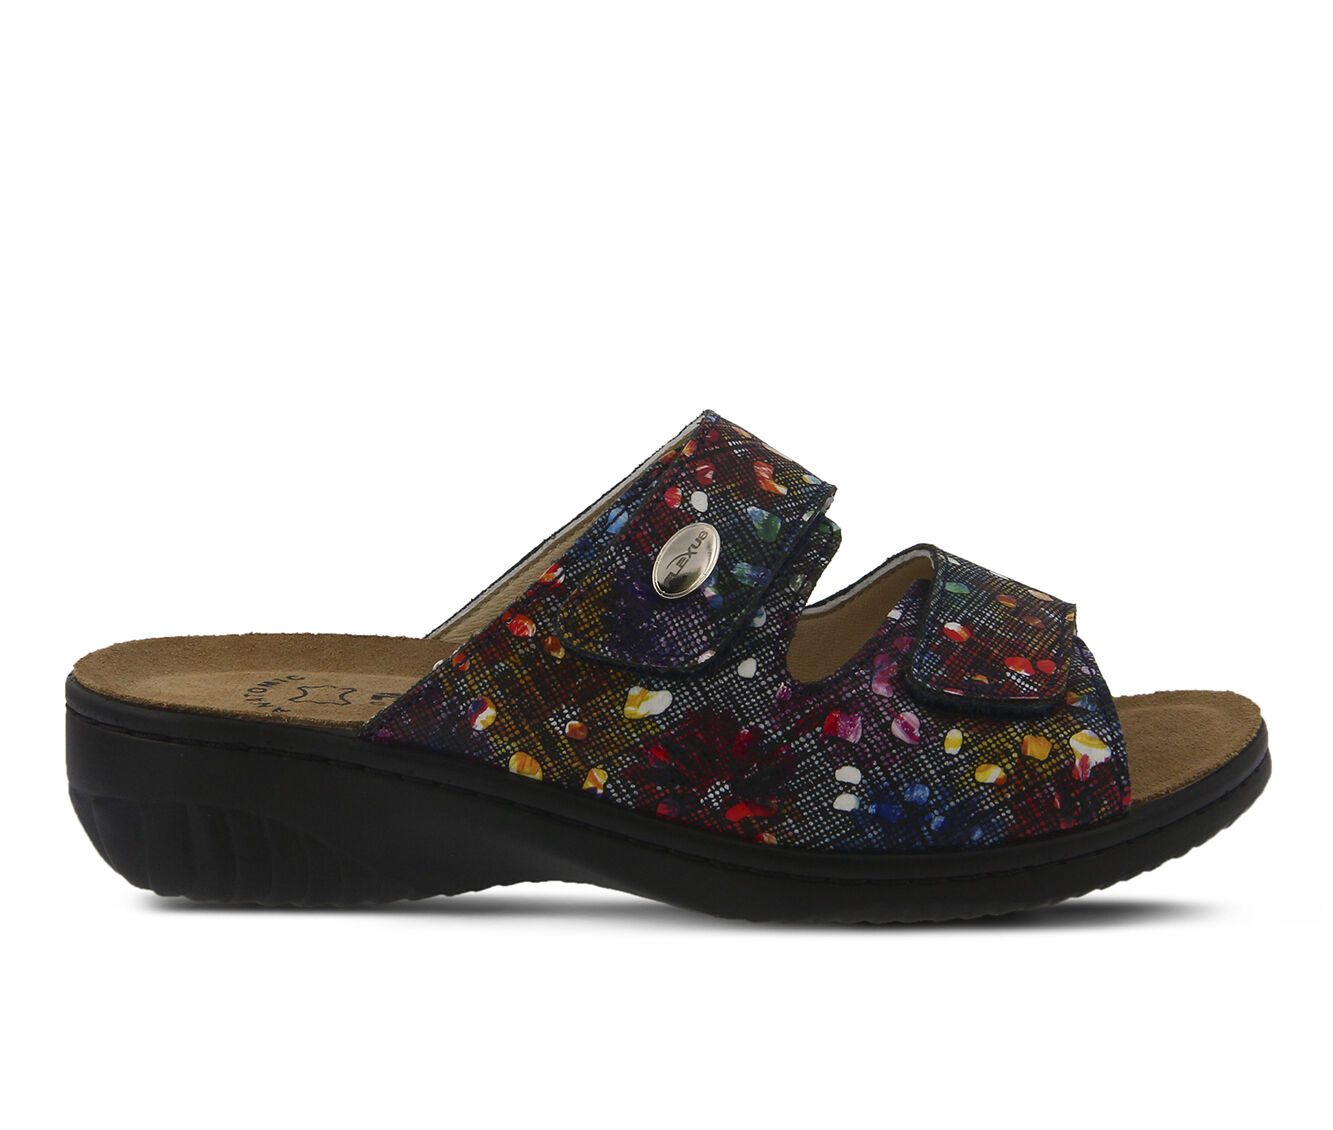 Women's FLEXUS Bellasa Sandals Black Multi